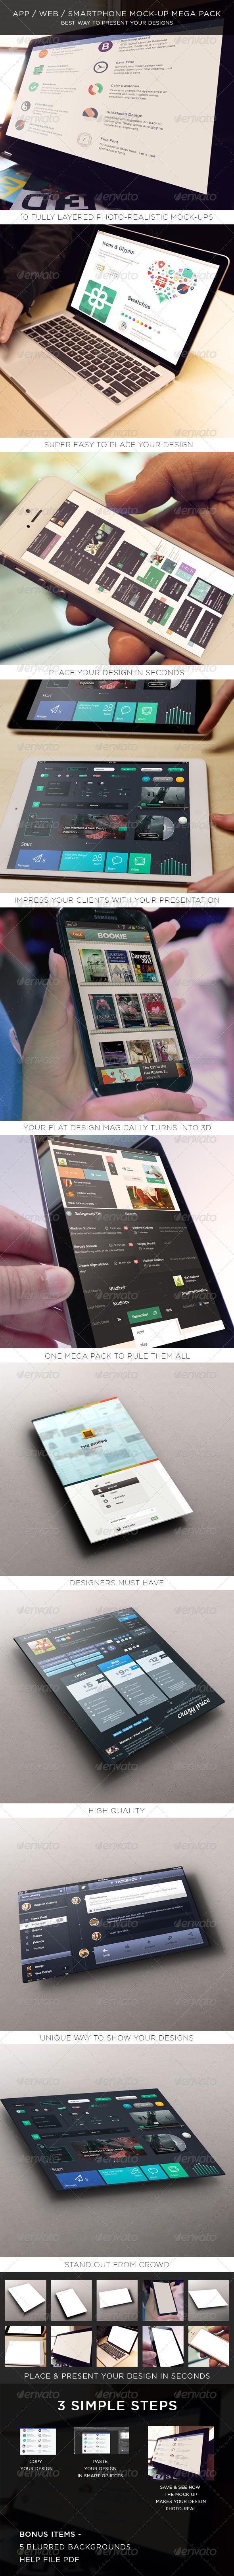 App / Web / Smartphone Mock-Up Mega Pack  - Miscellaneous Apparel